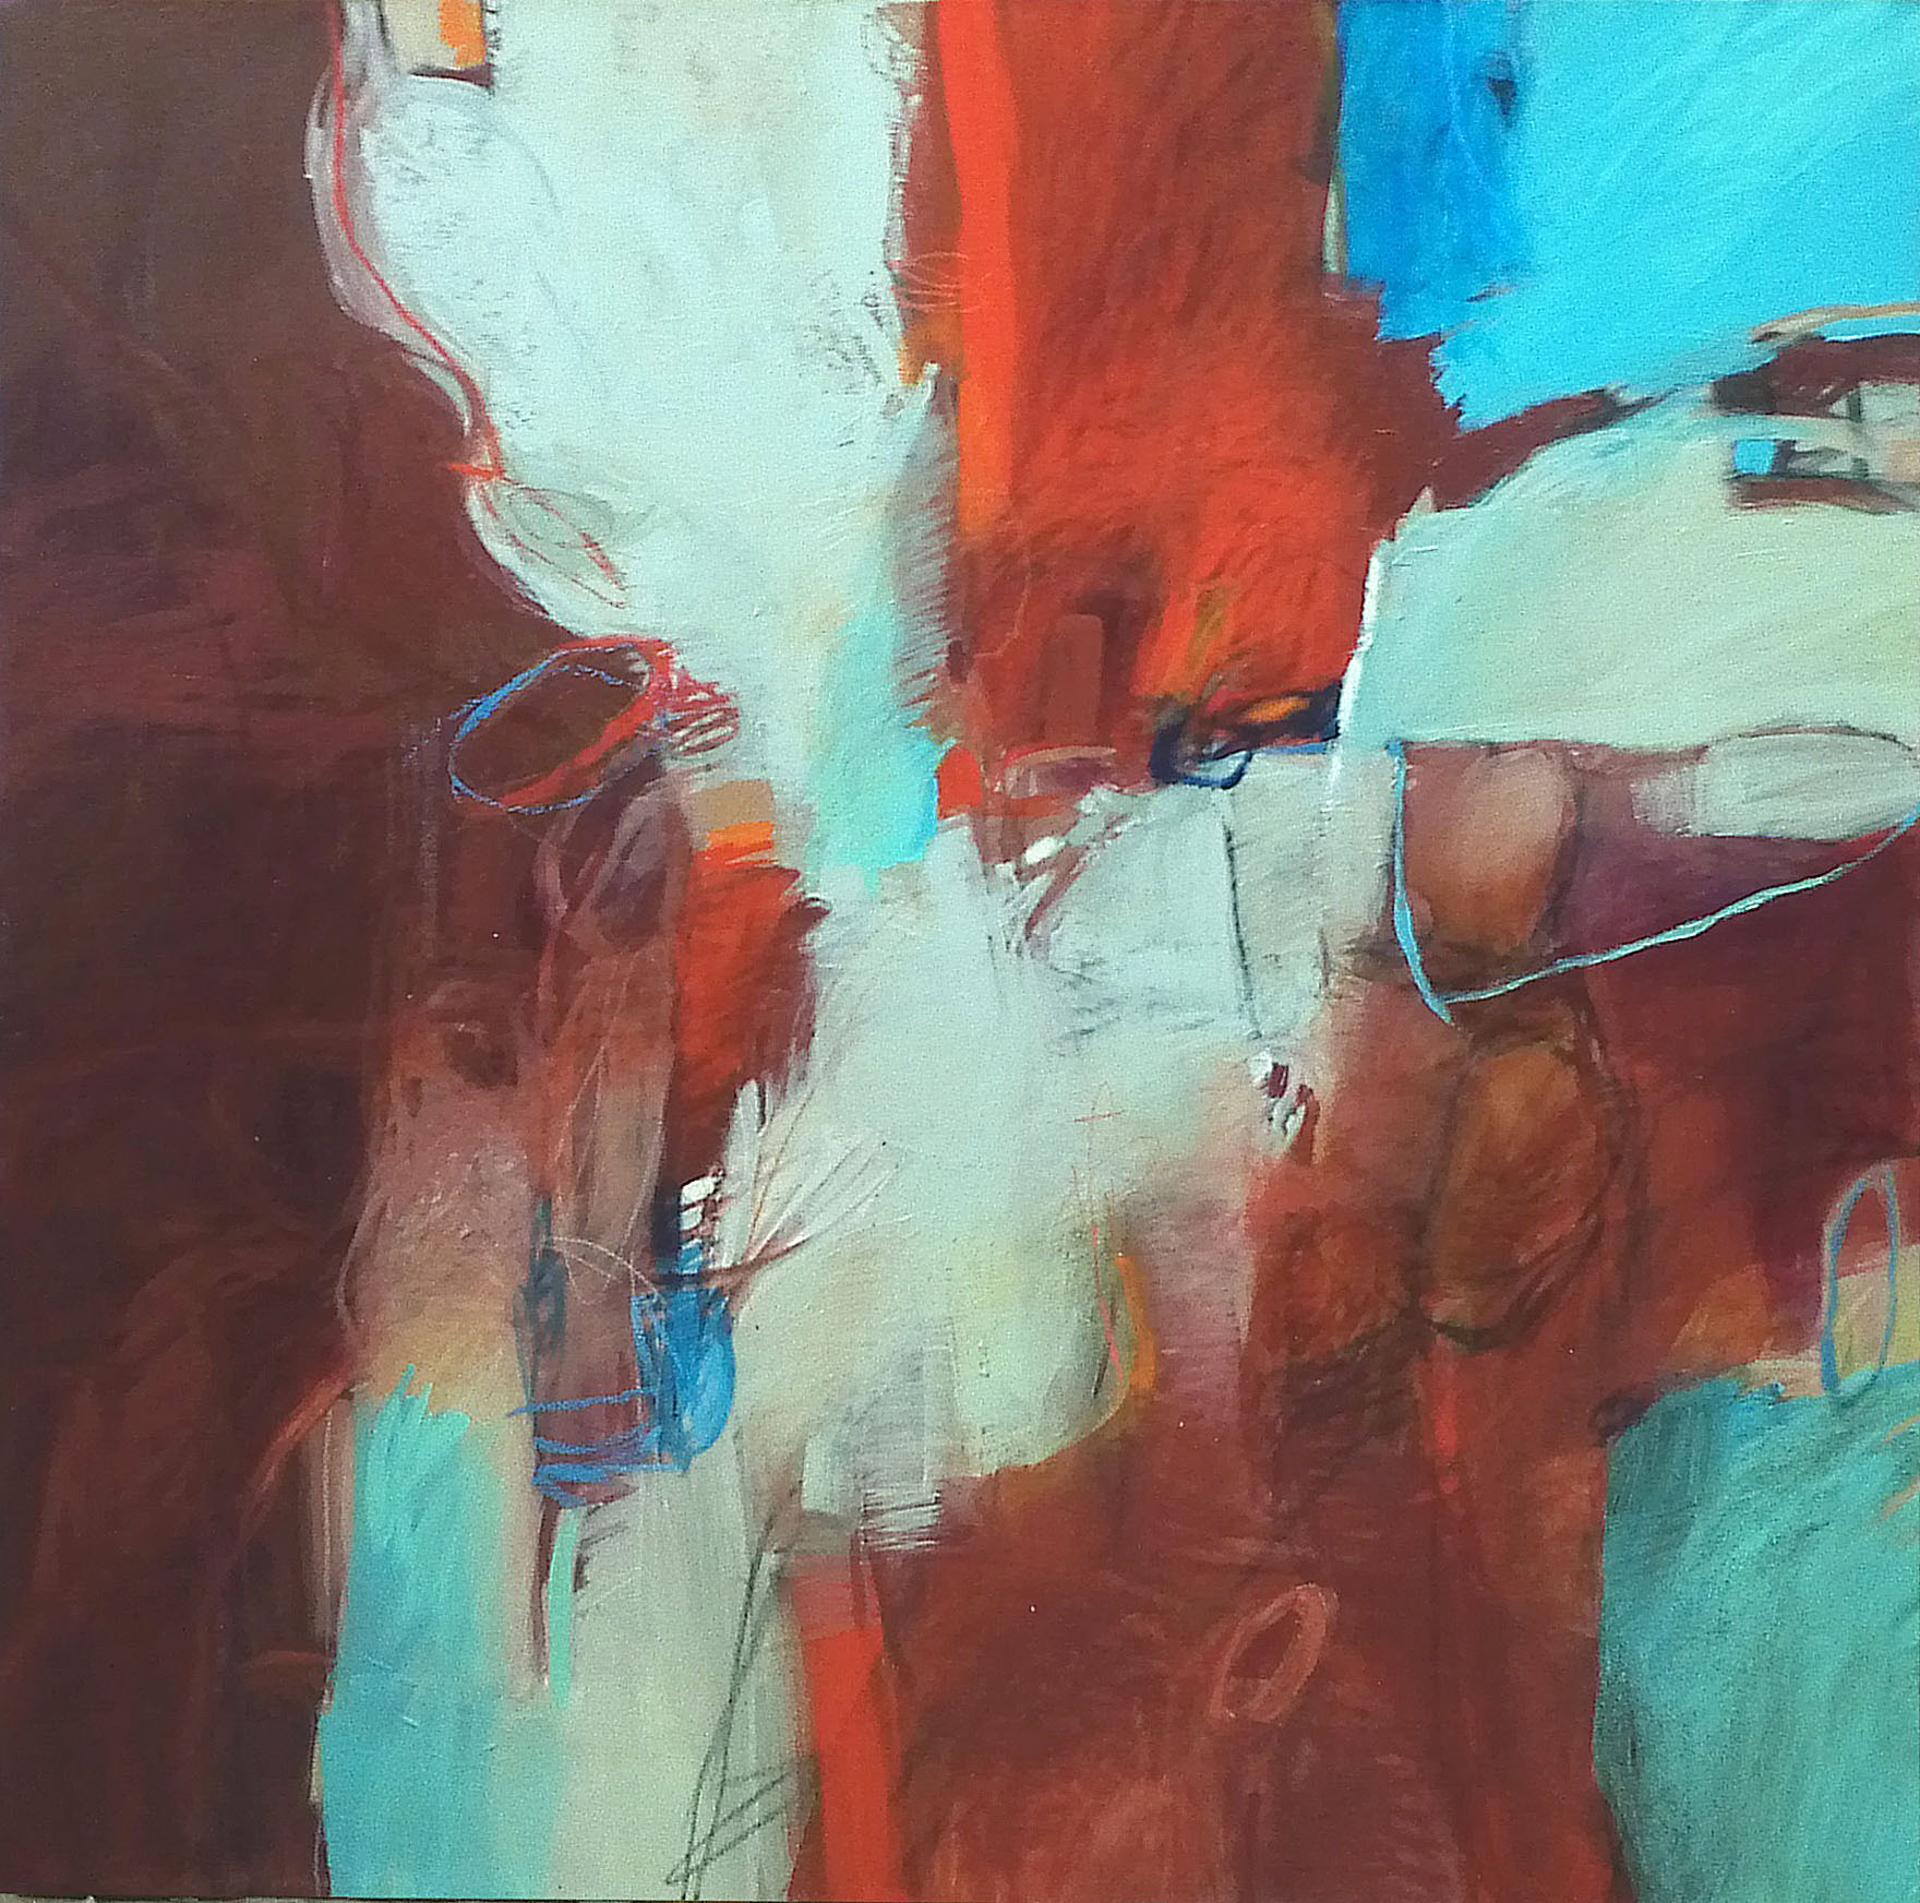 Untitled 171052 by Karen Roehl